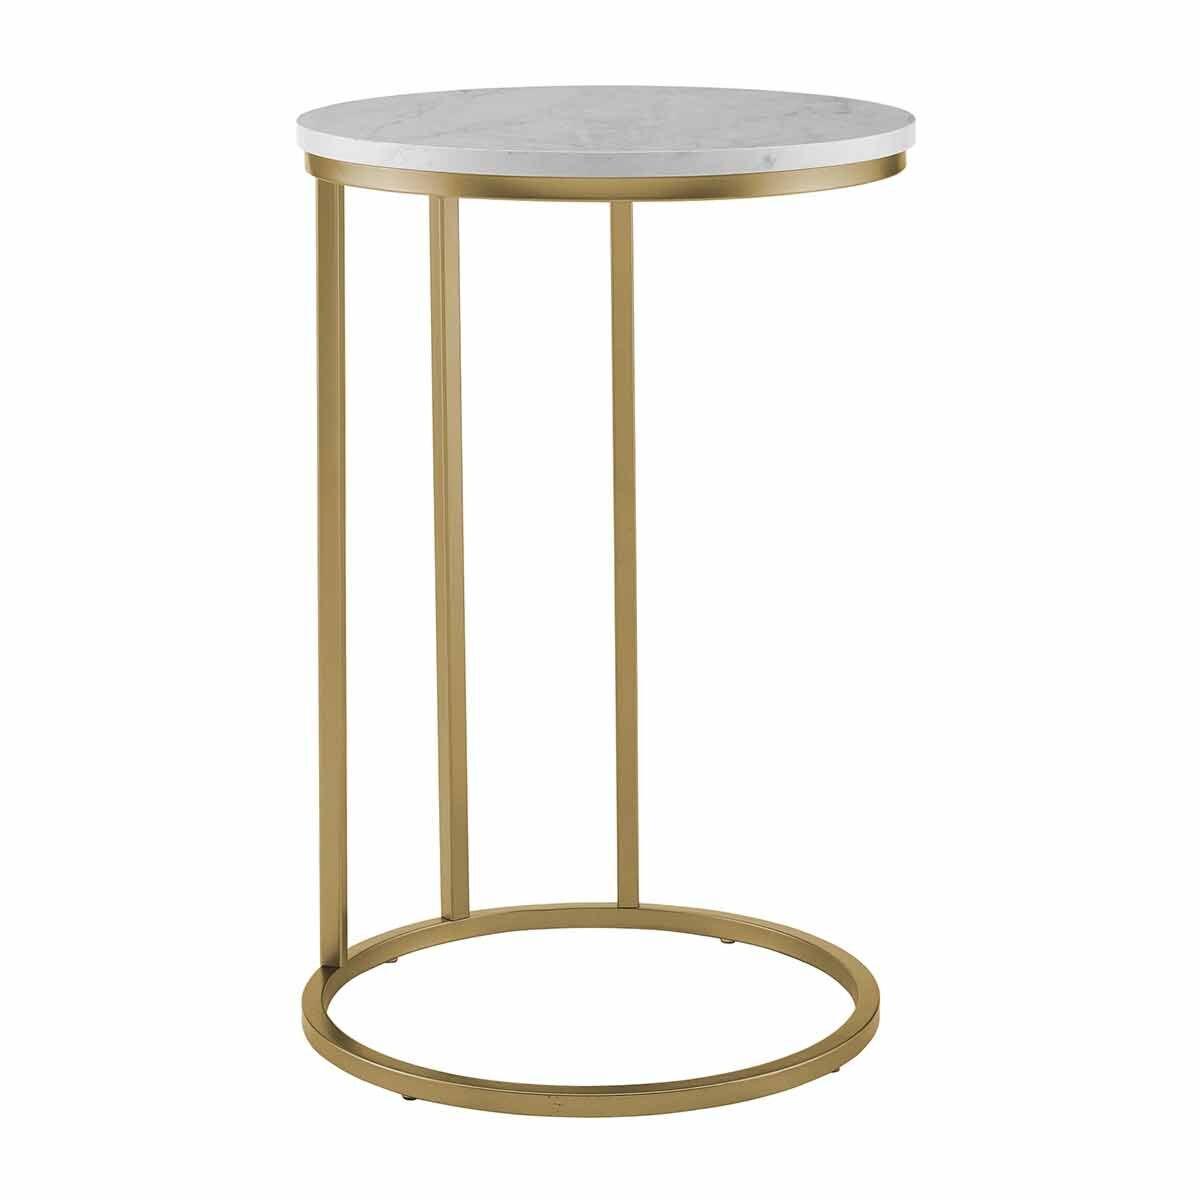 Cadiz Modern Round End Table White Marble